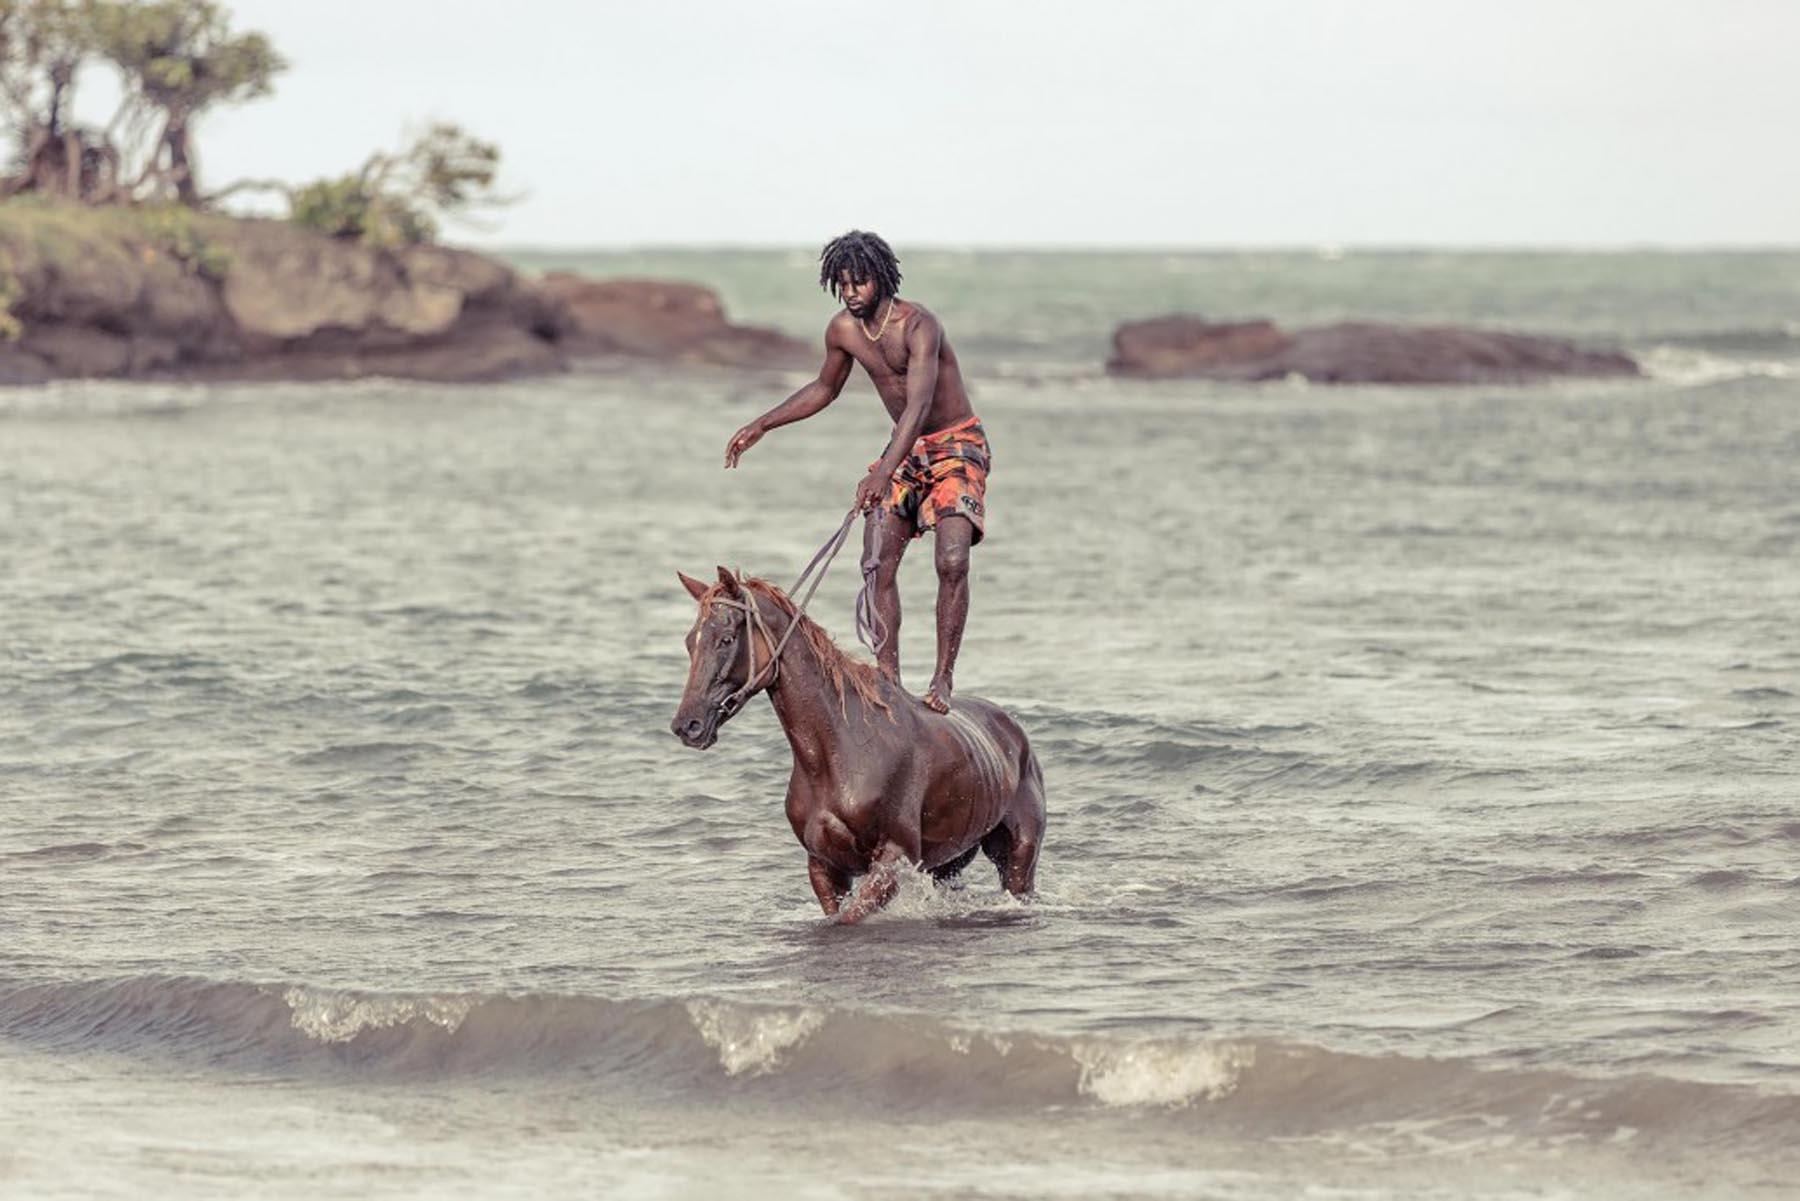 Richard Wadey Man in Sea with Horse